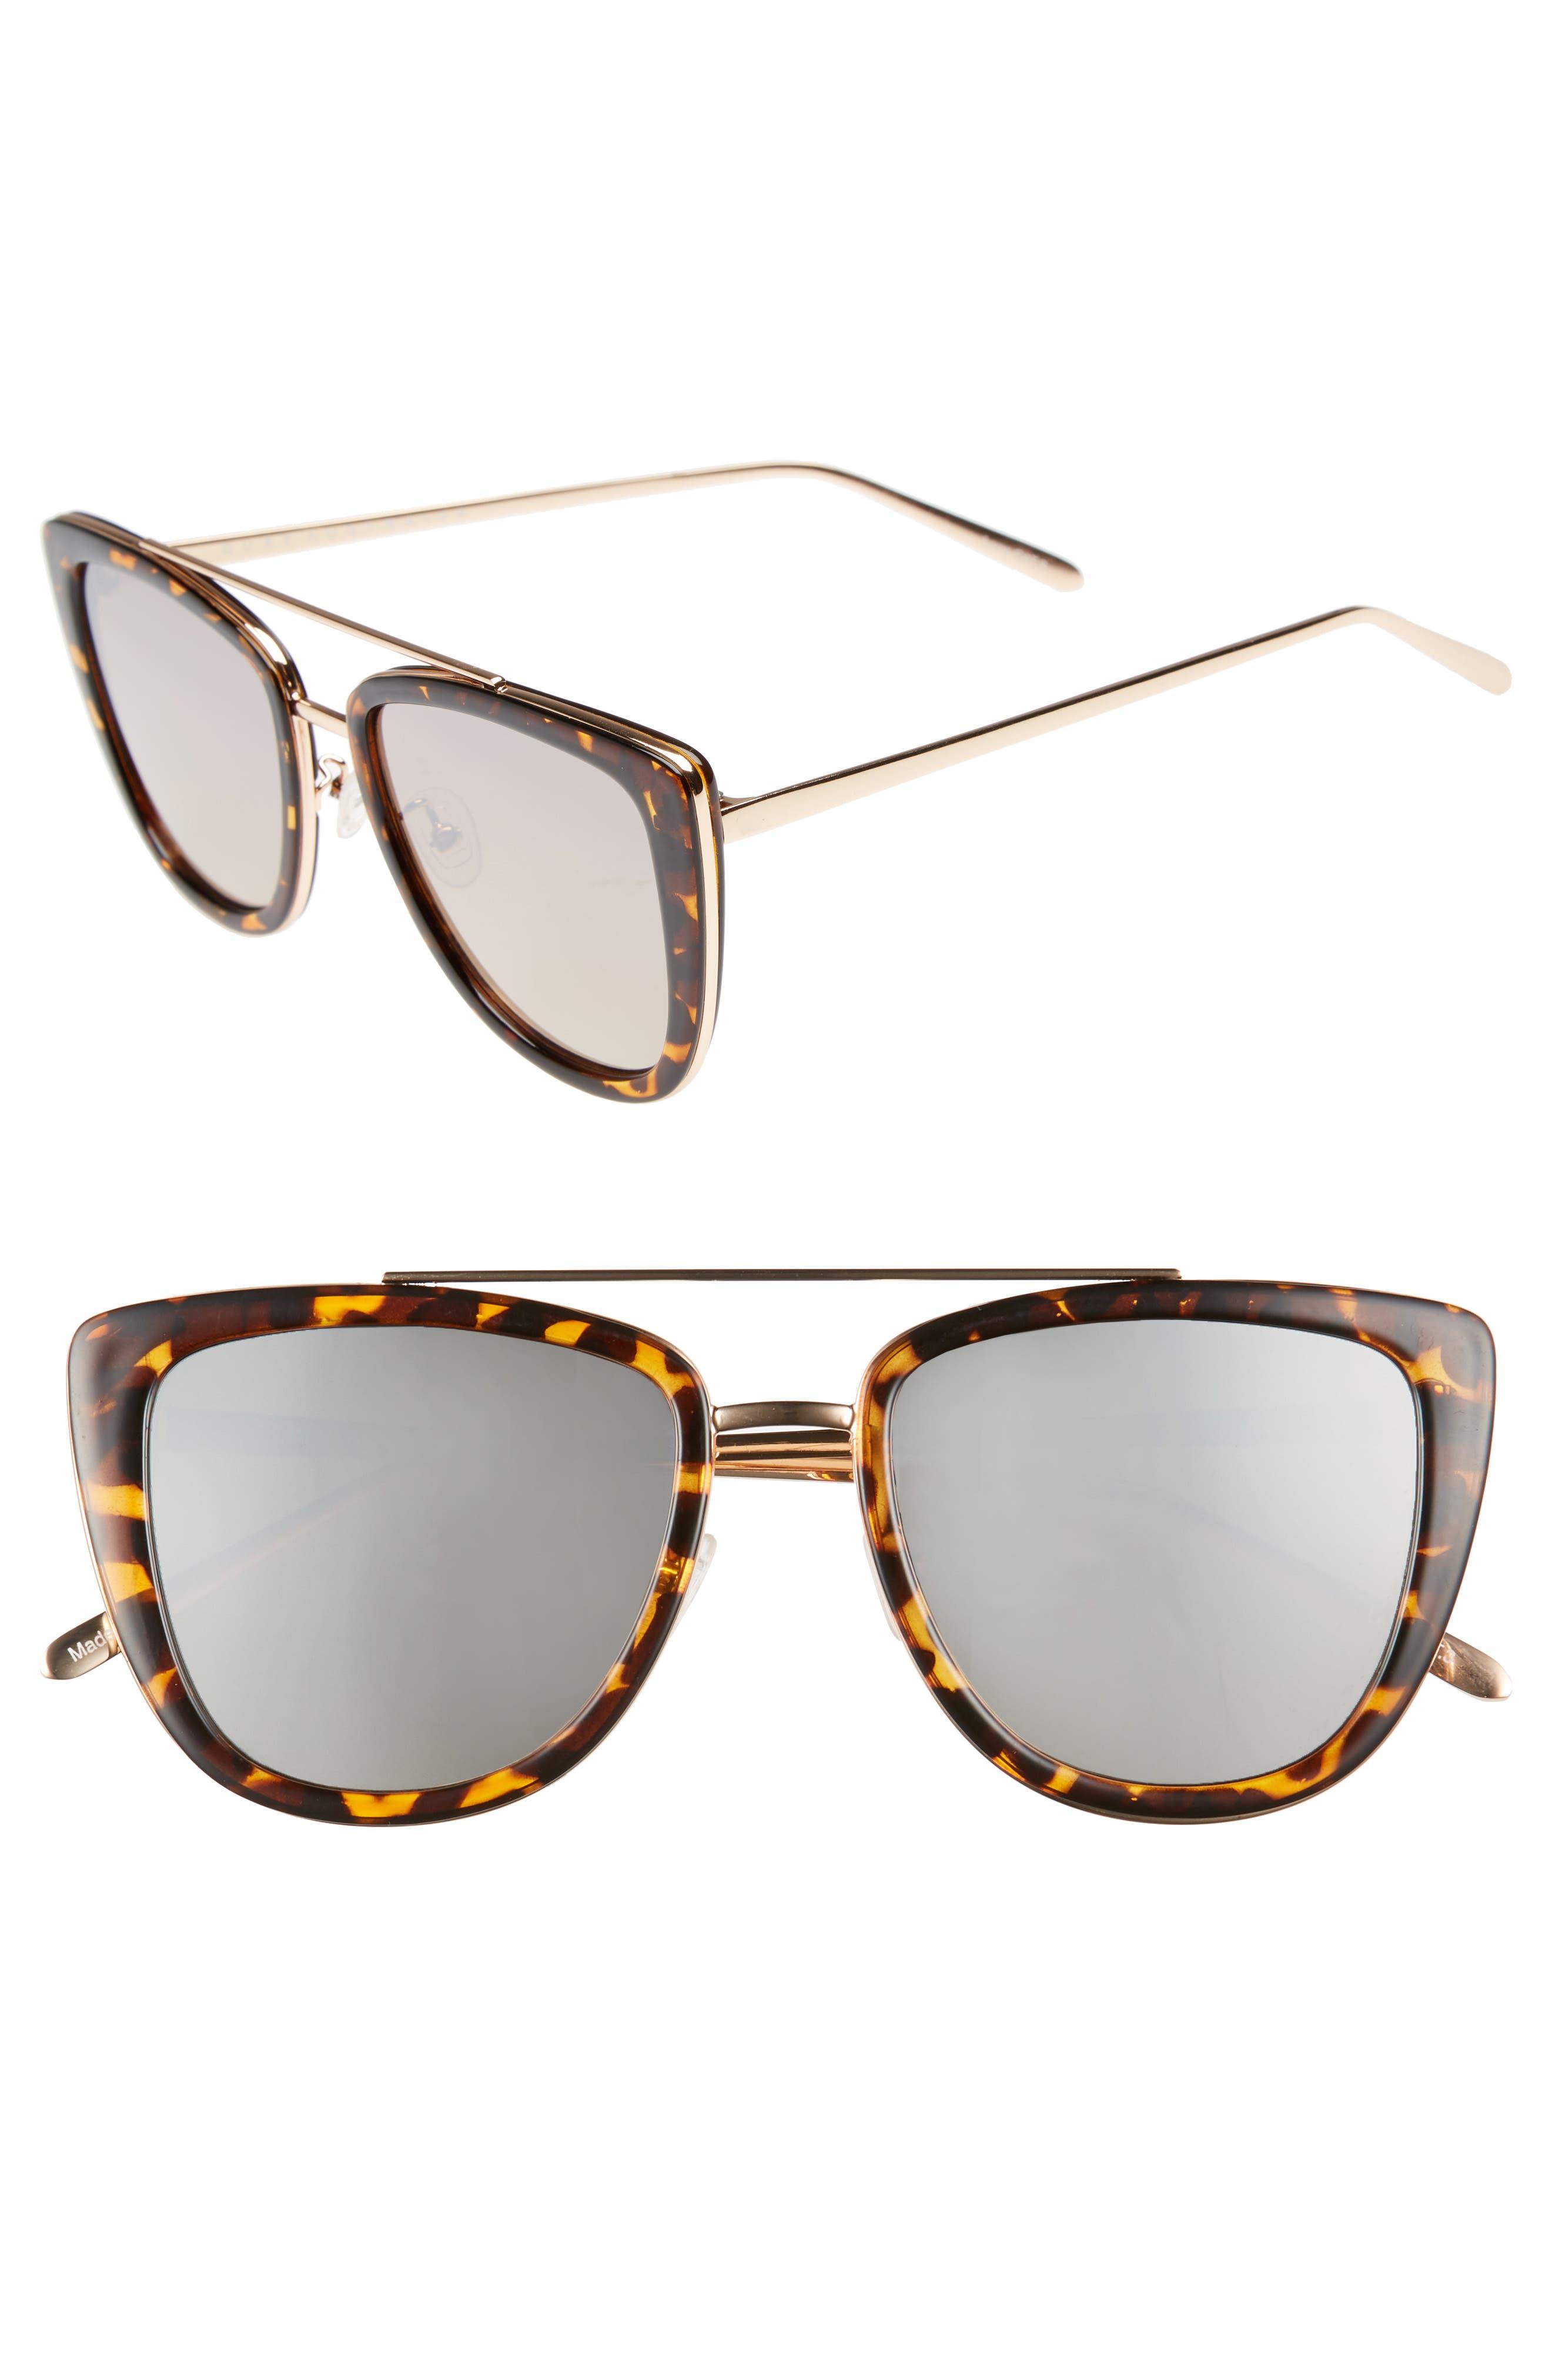 Quay Australia French Kiss 55Mm Cat Eye Sunglasses - Tort/gold